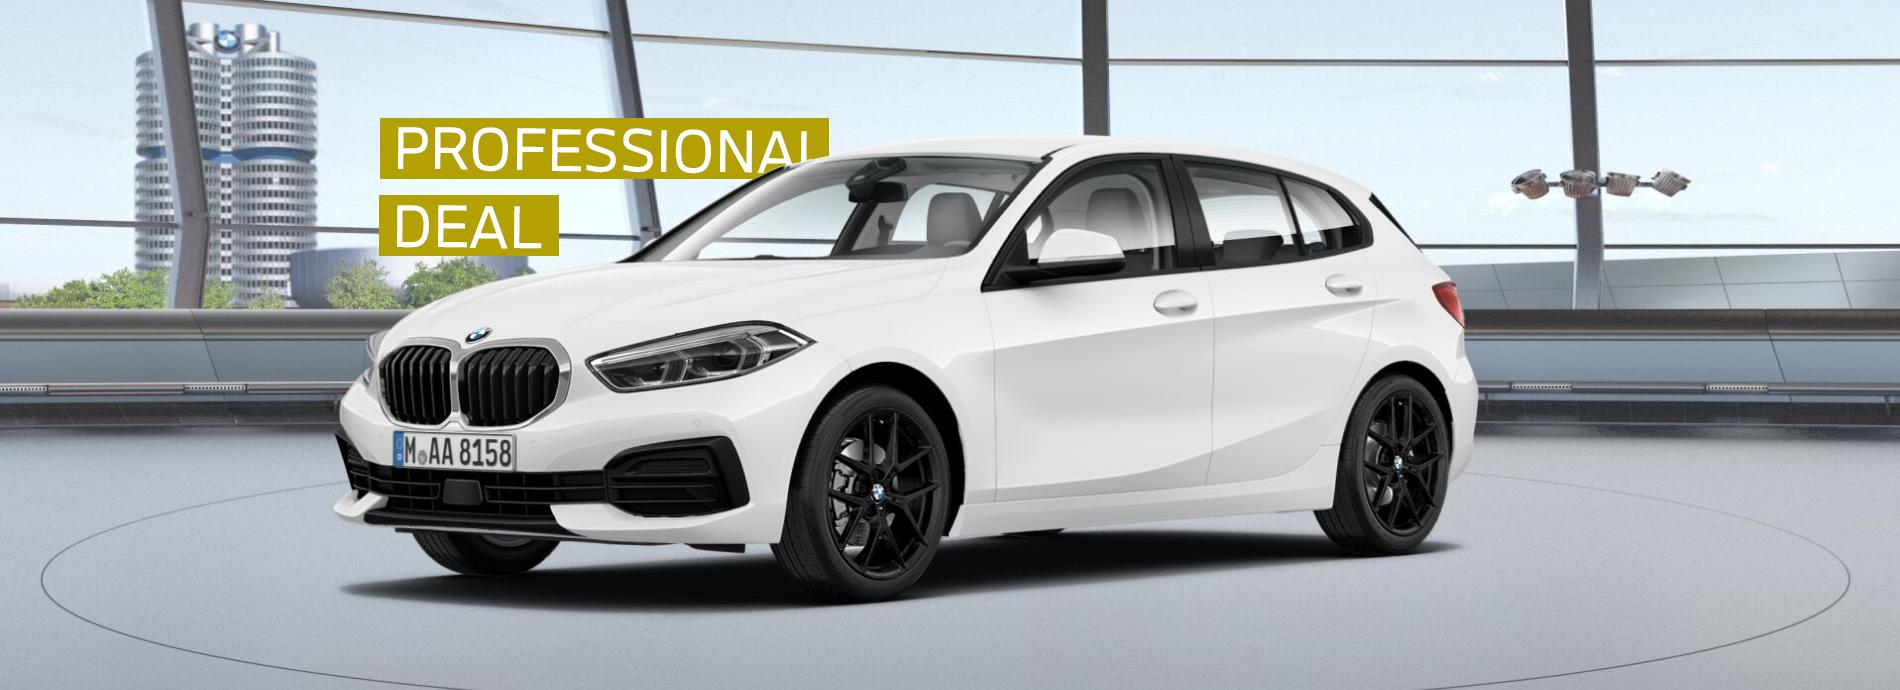 BMW 116i PROFESSIONAL DEAL